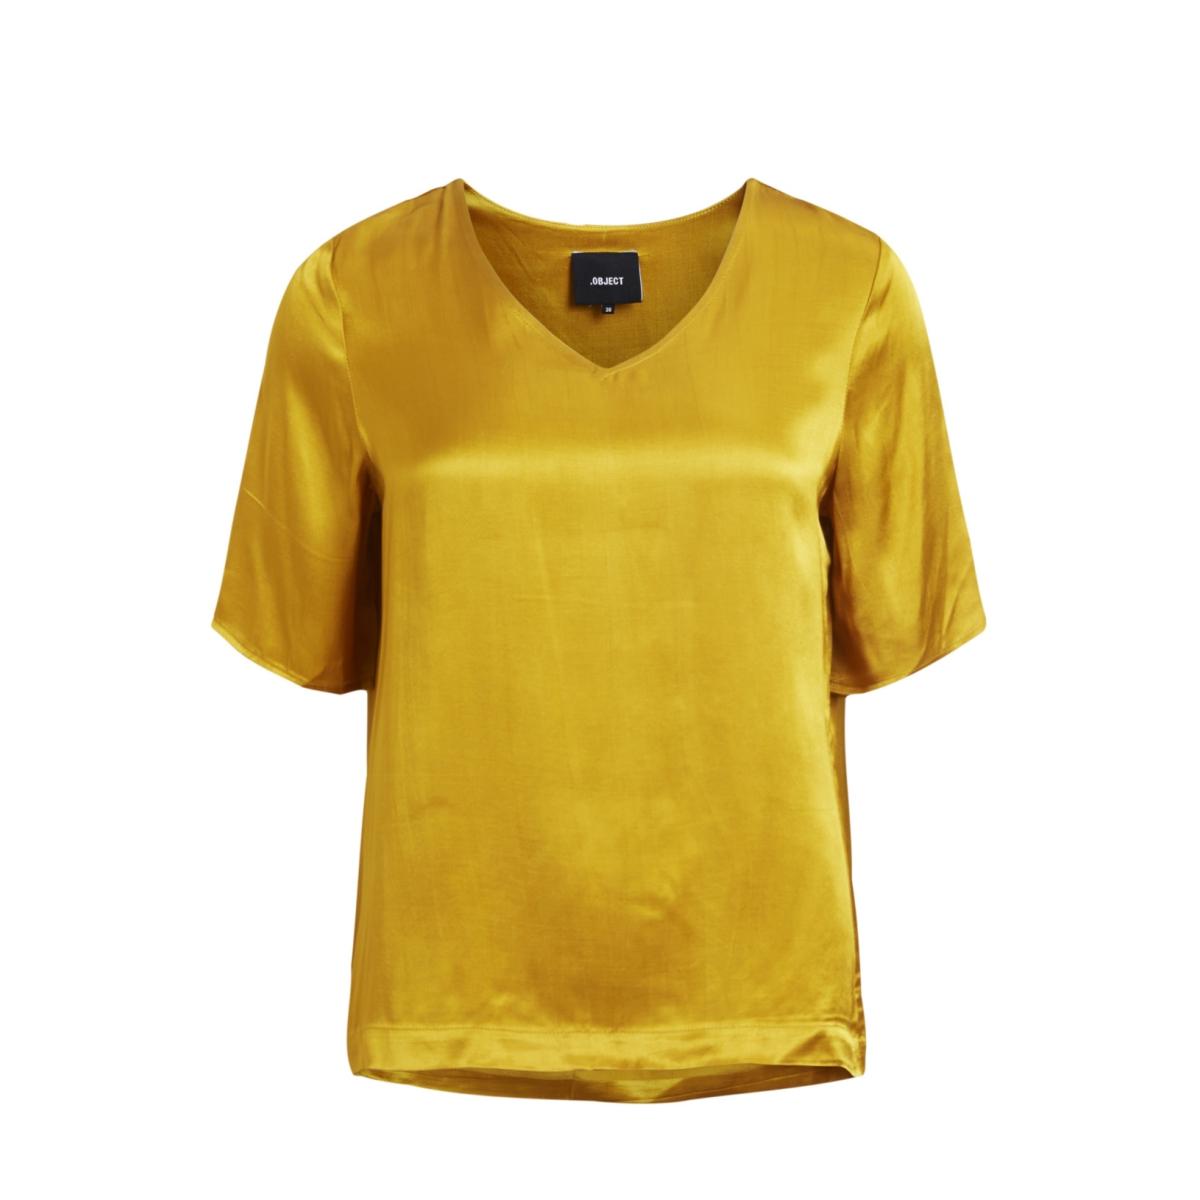 objnora 2/4 top au a 23026370 object t-shirt harvest gold